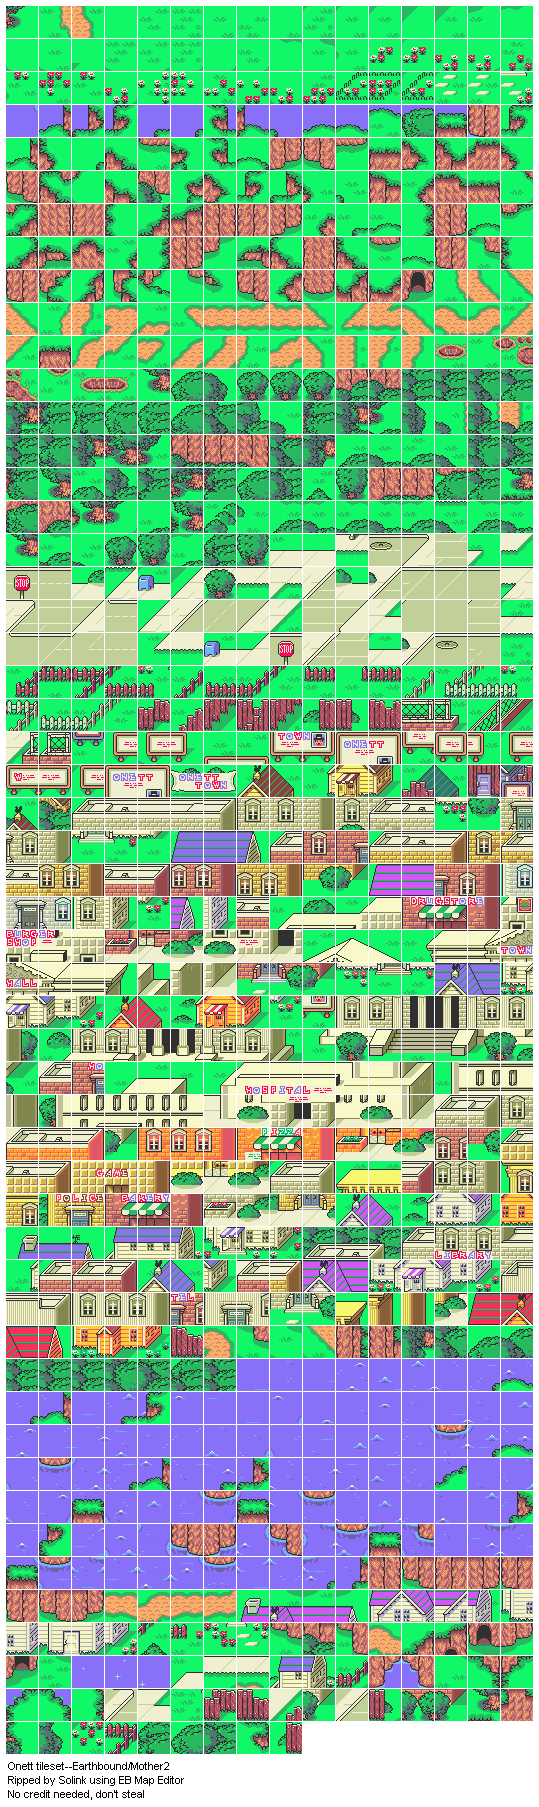 Super Adventure R >> SNES - Earthbound / Mother 2 - Onett Tileset - The Spriters Resource